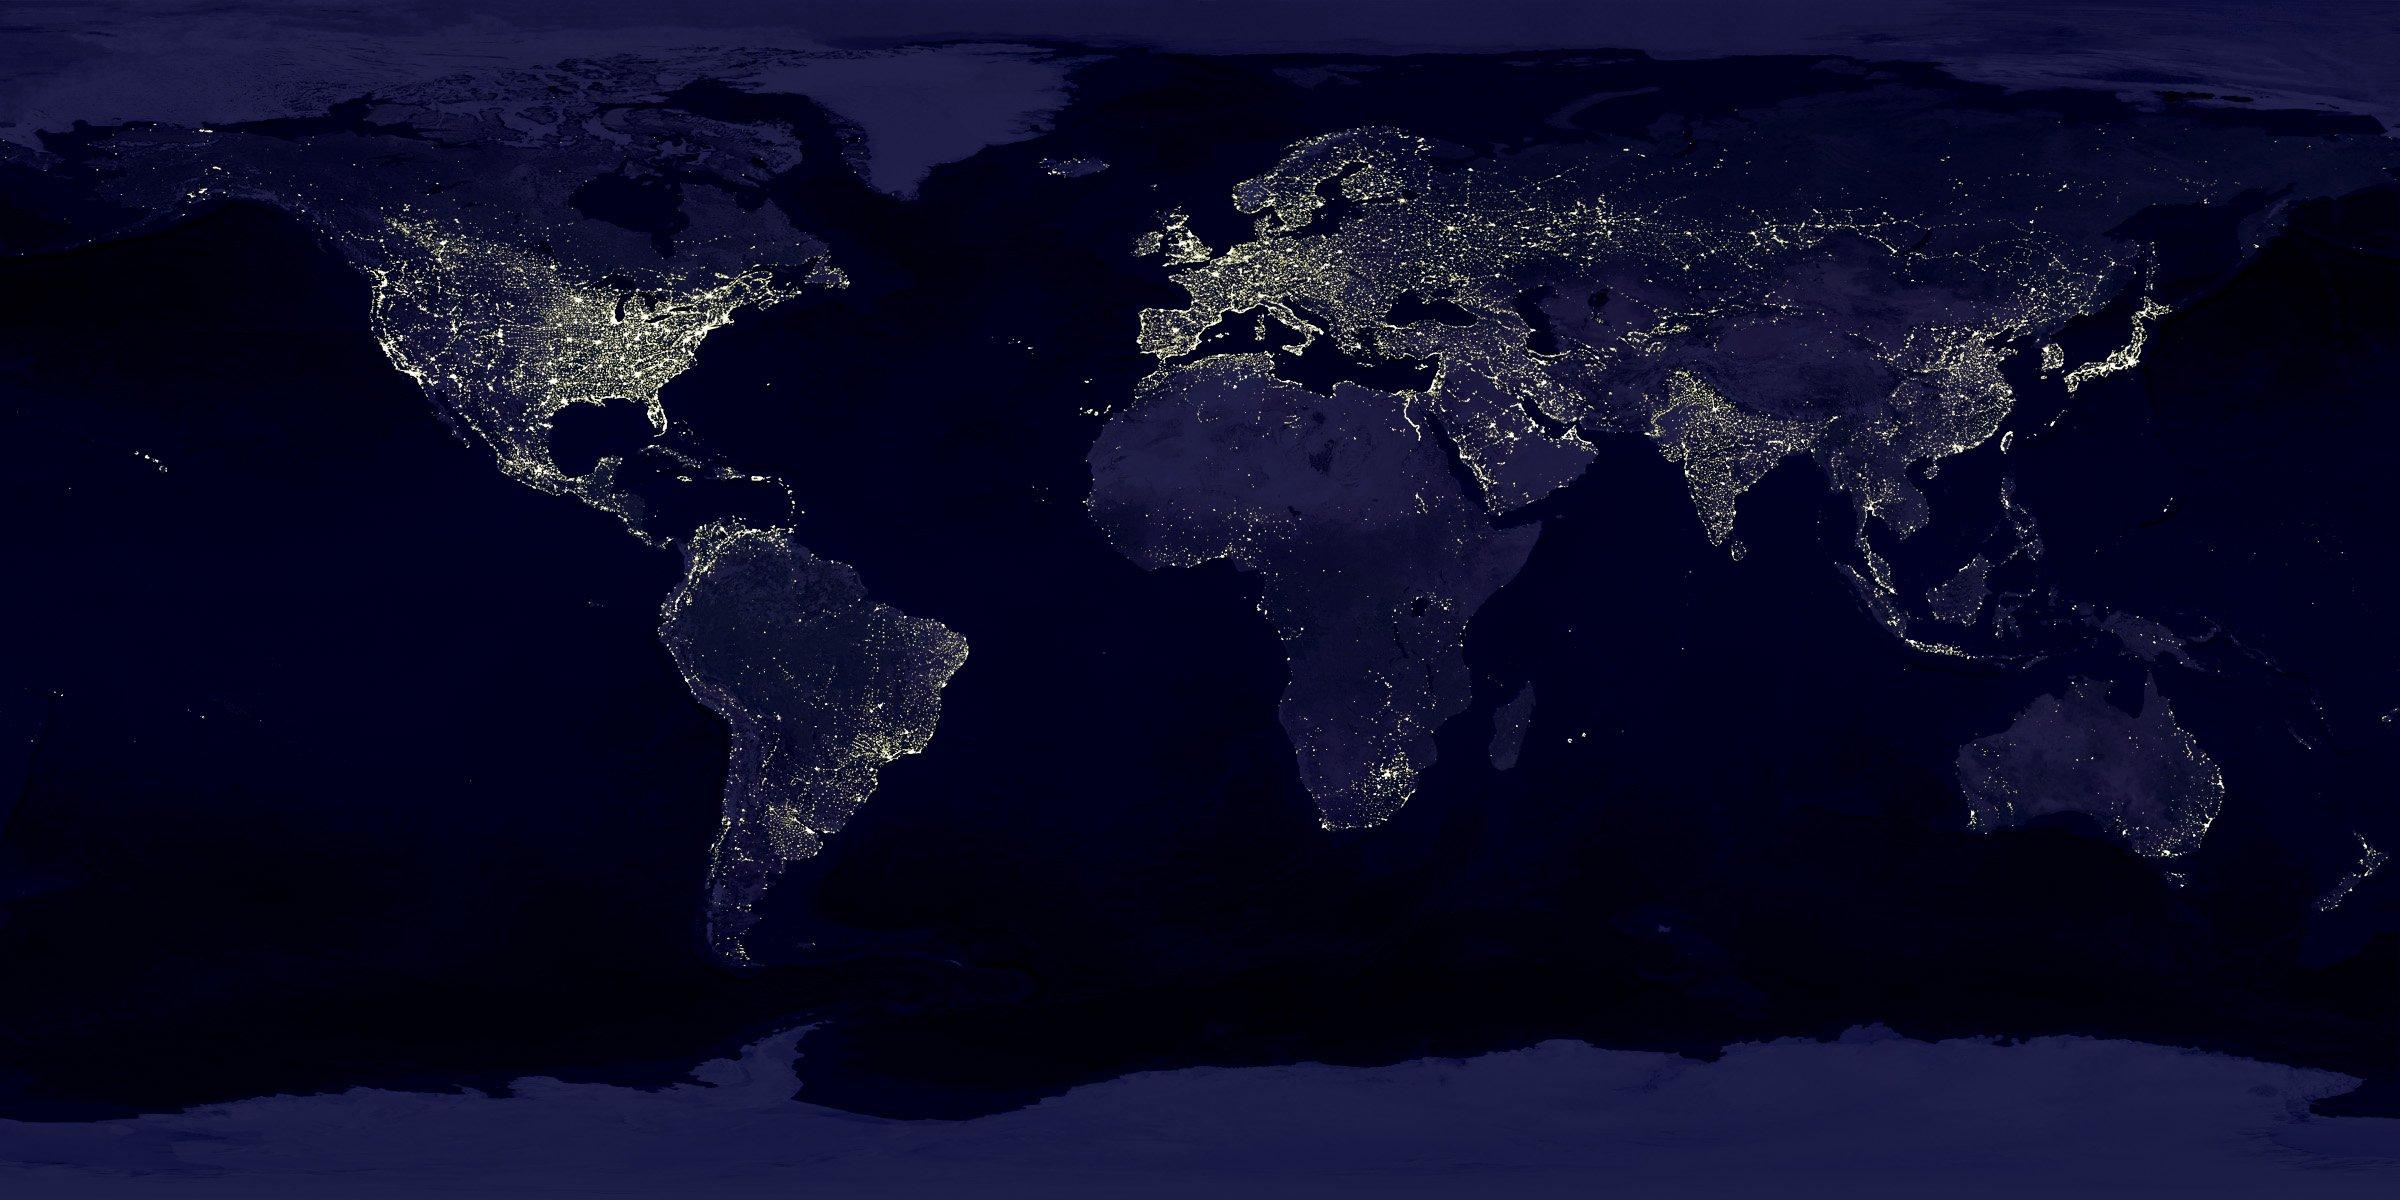 Atmosphere Arctic Lighting Moonlight